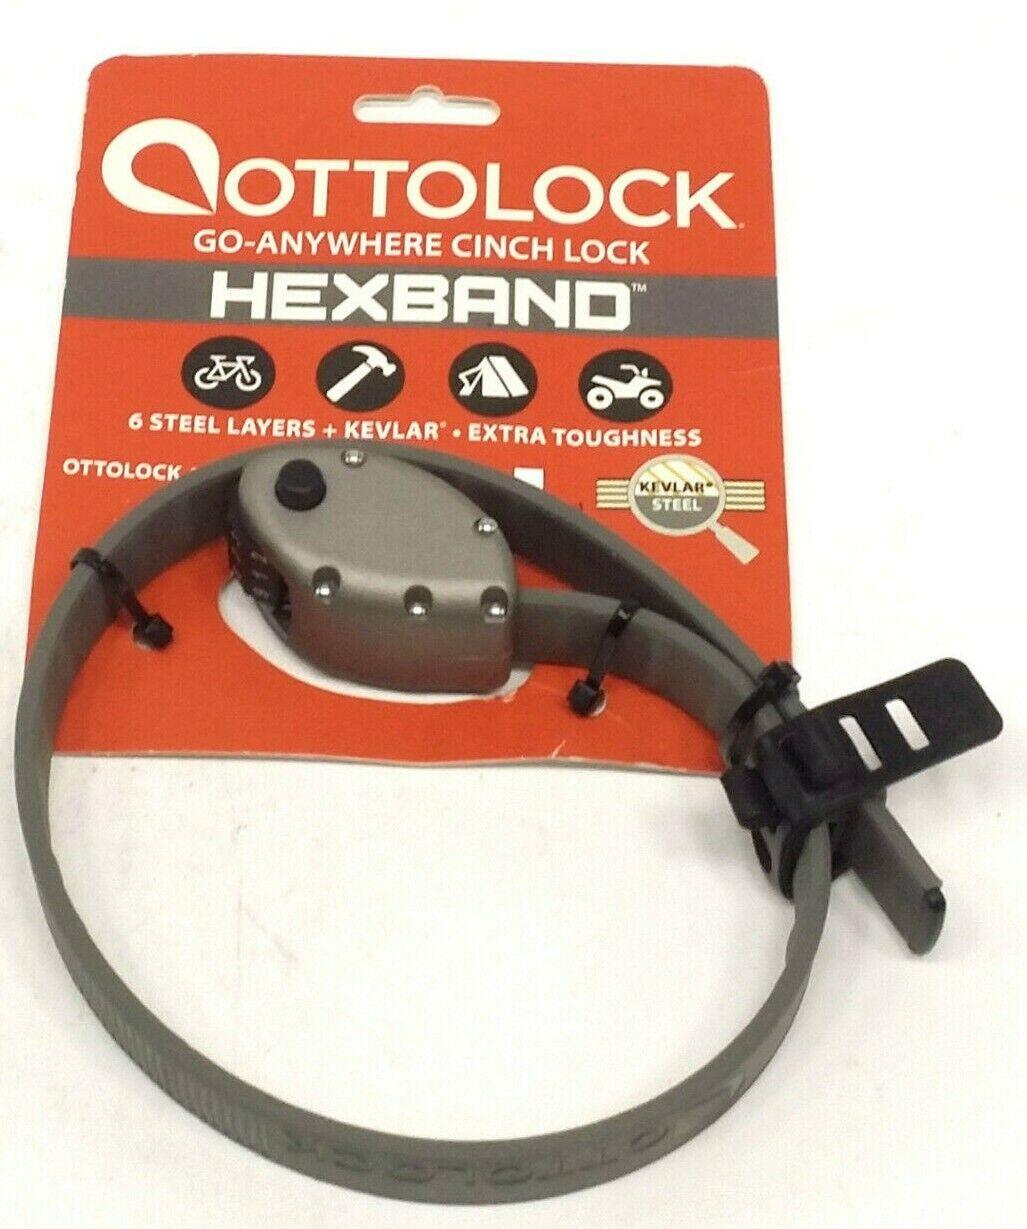 Steel Hexband Ti Grey or Cinch Camo 30 or 60 Combination Otto Lock With Kevlar